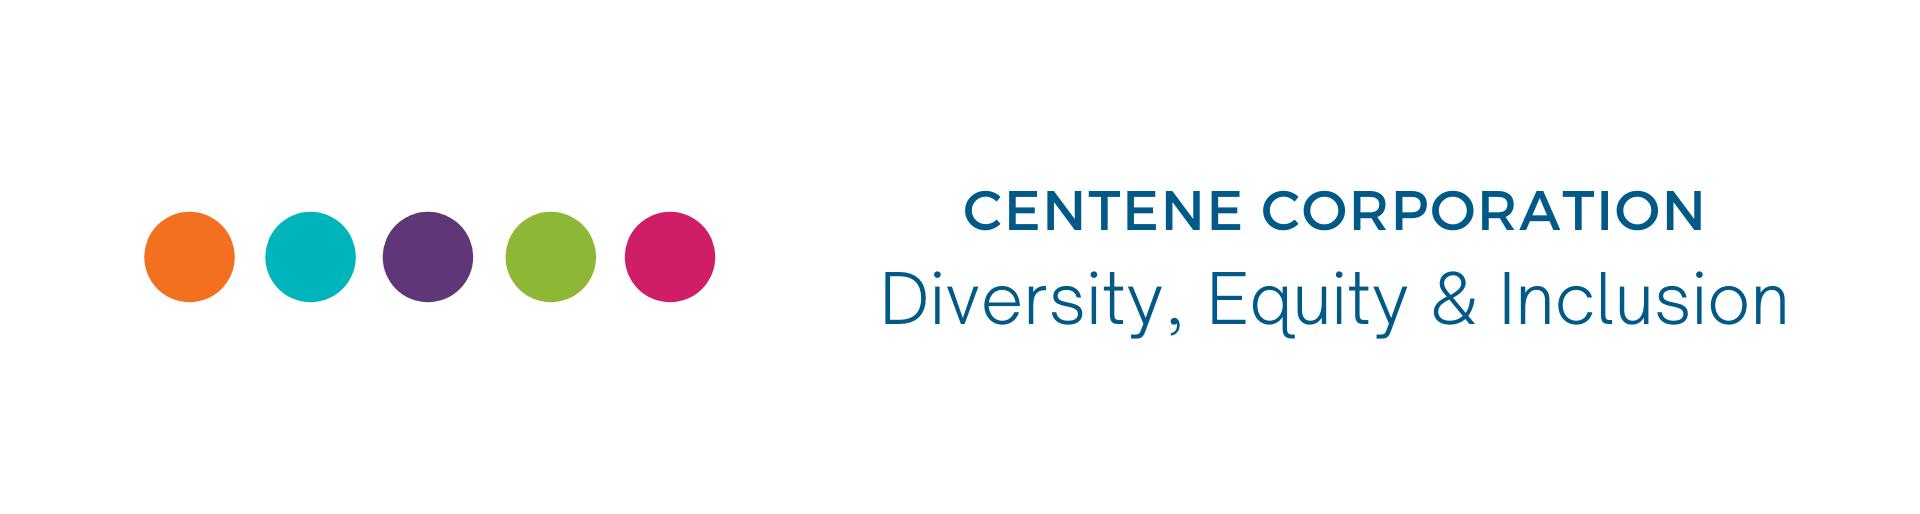 Centene Corporation Diversity & Inclusion